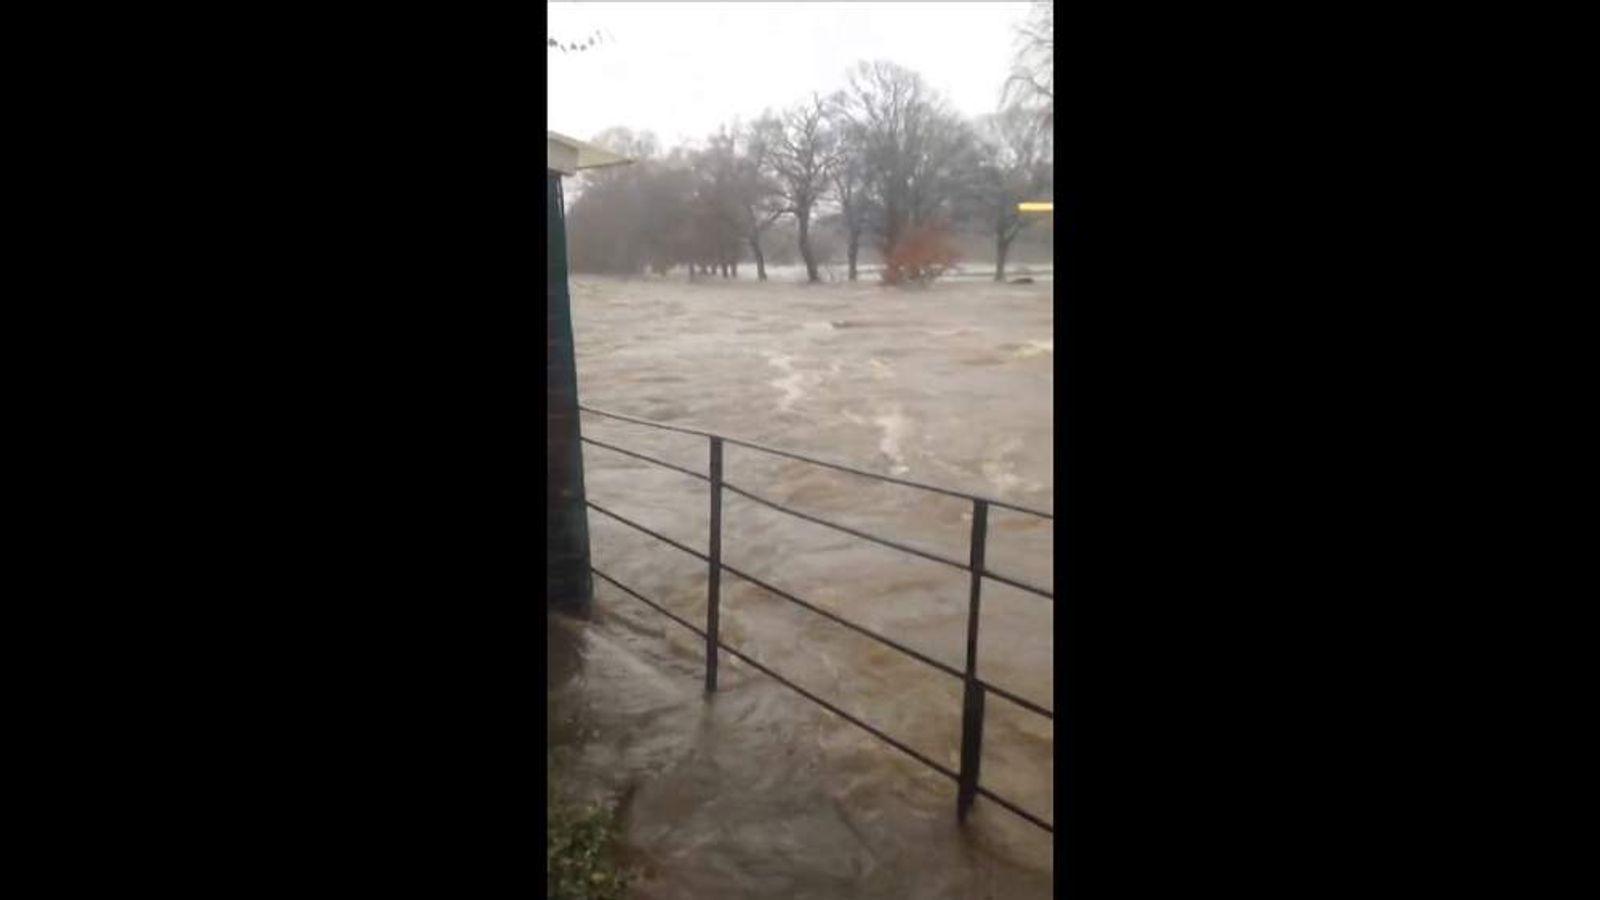 Flooding in Keswick, Cumbria. Pic: Wayne Turner/Twitter